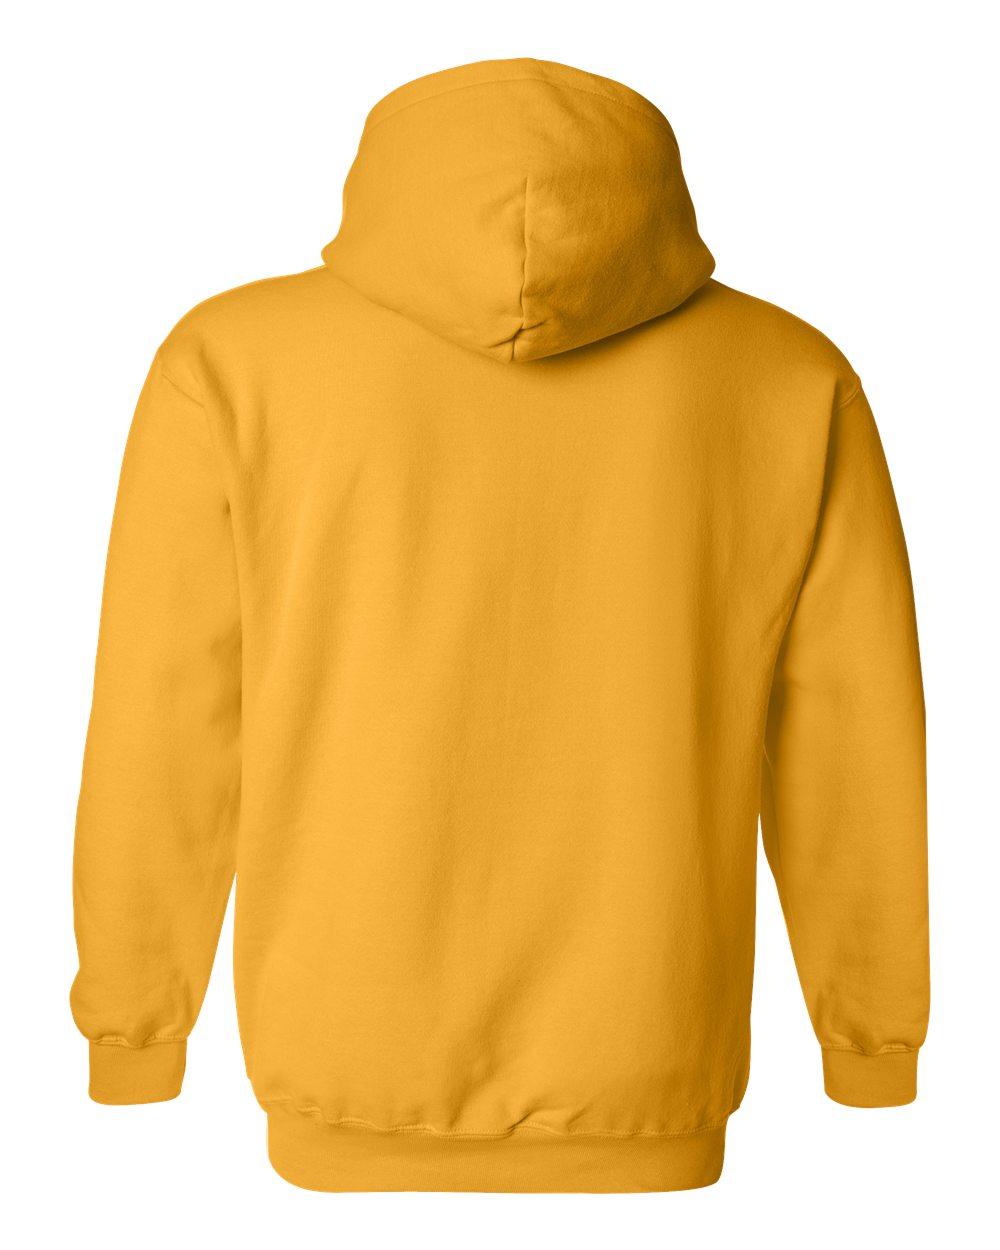 Gildan-Mens-Blank-Hoodie-Heavy-Blend-Hooded-Sweatshirt-Solid-18500-up-to-5XL thumbnail 34